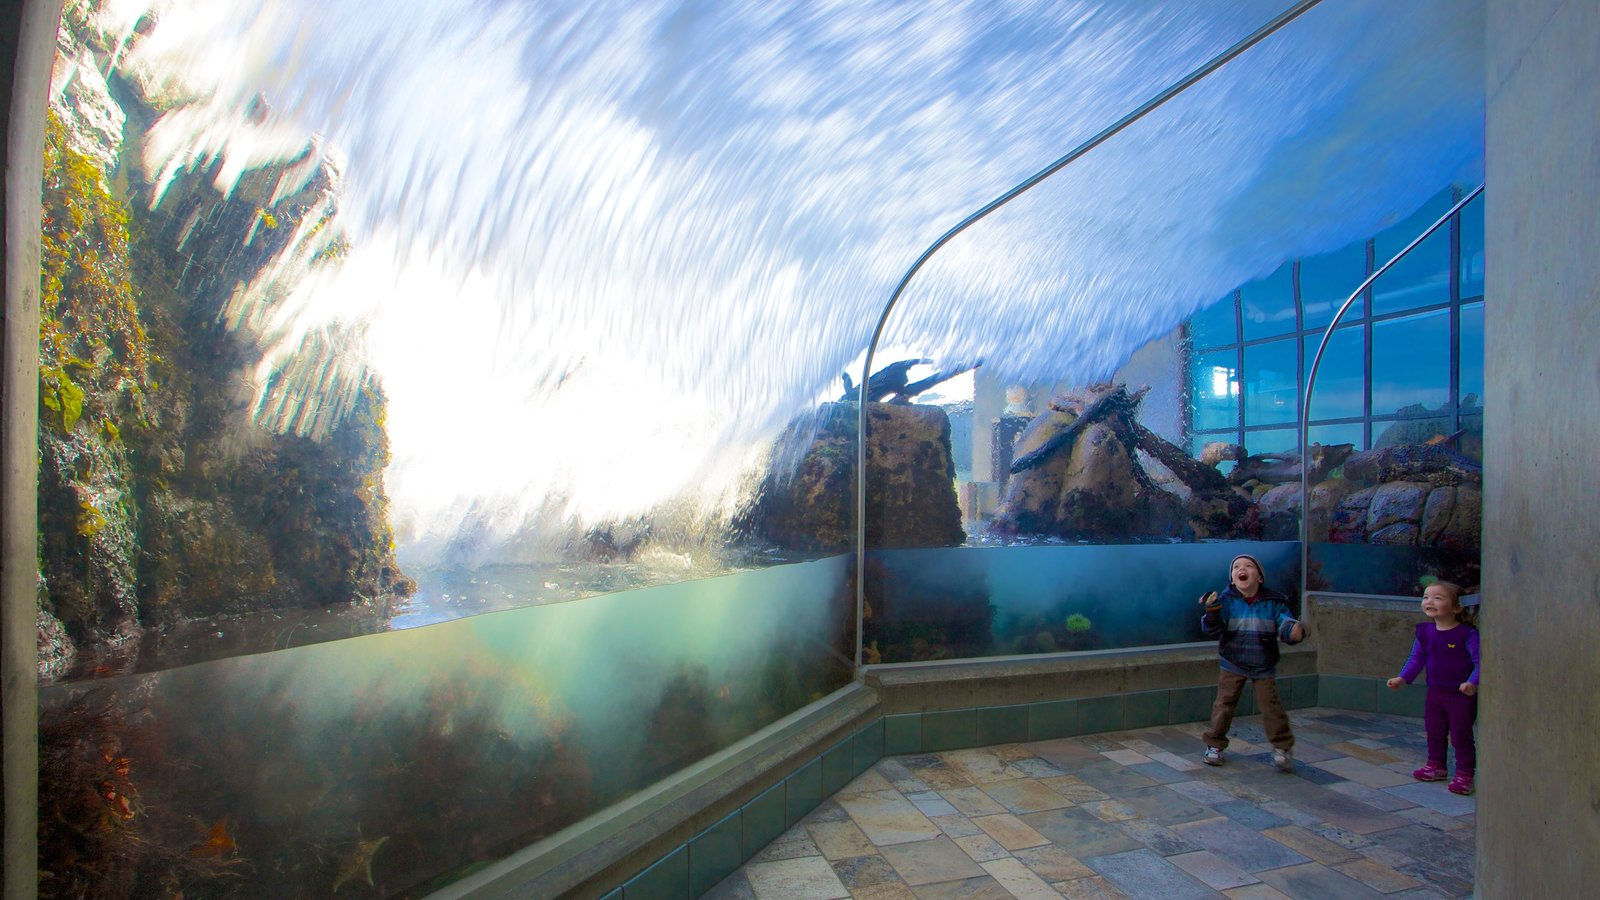 Monterey Bay Aquarium which includes interior views, marine life and general coastal views